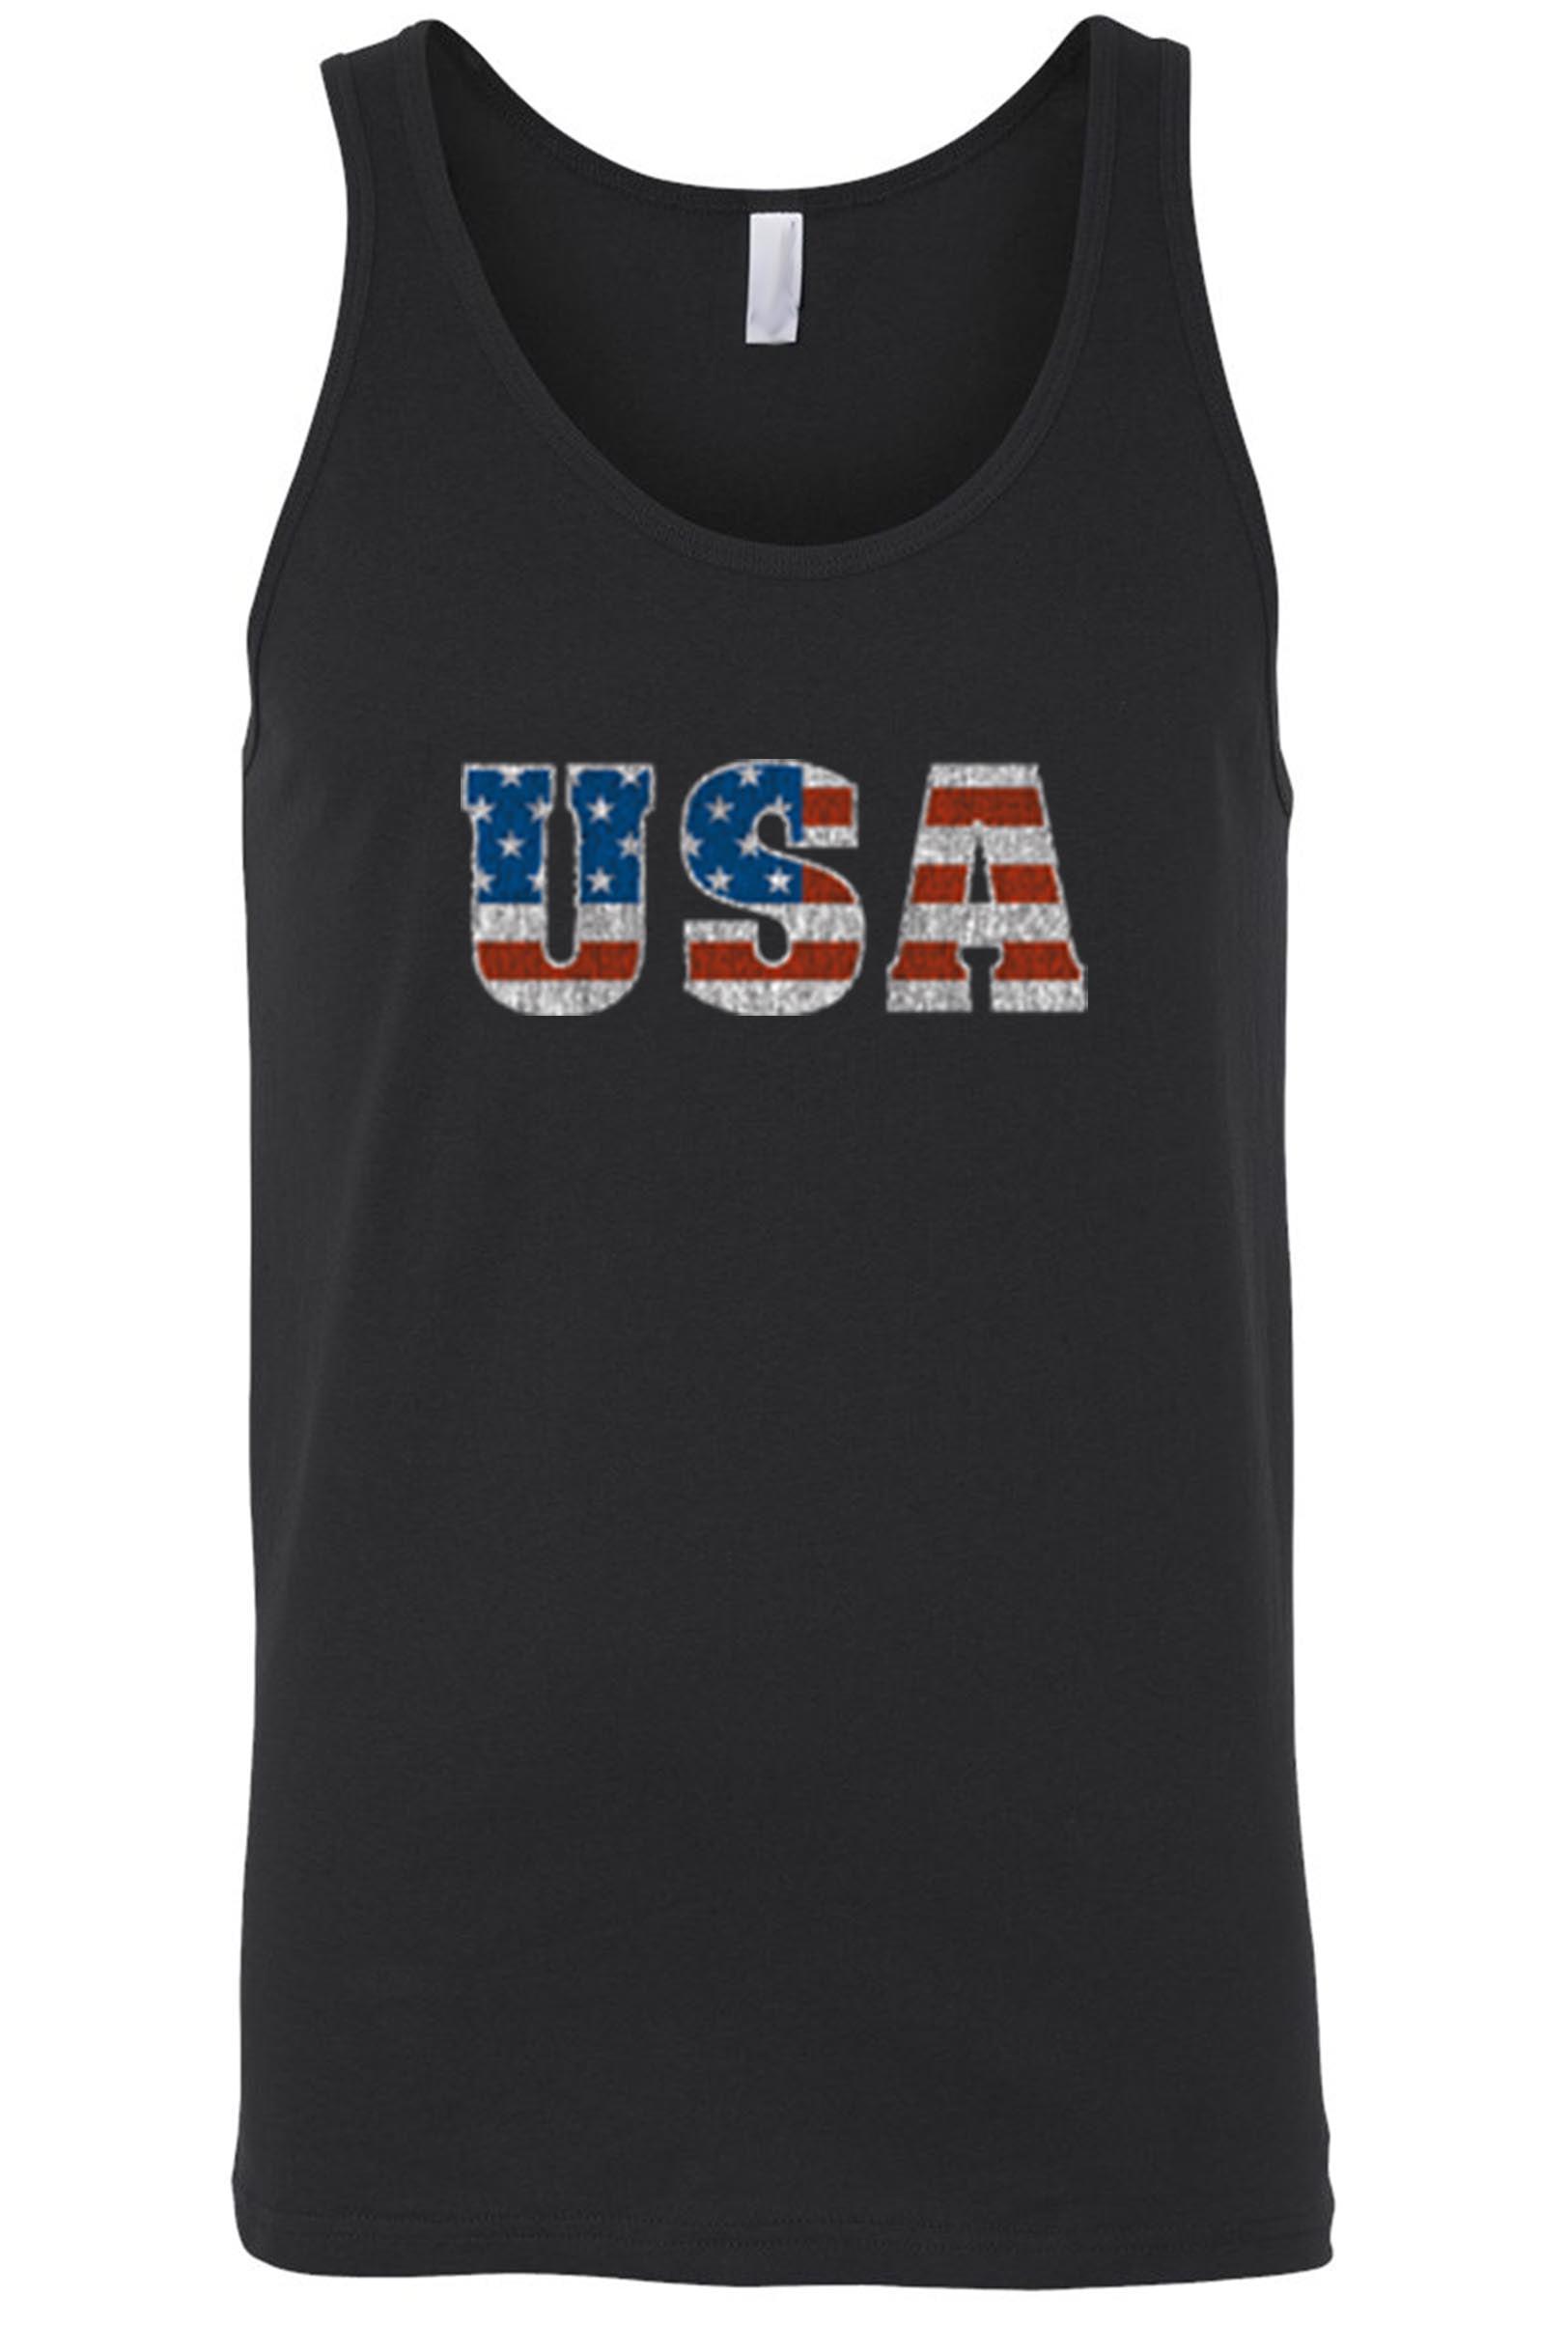 Men's/Unisex USA Flag Proud To Be An American Tank Top Shirt